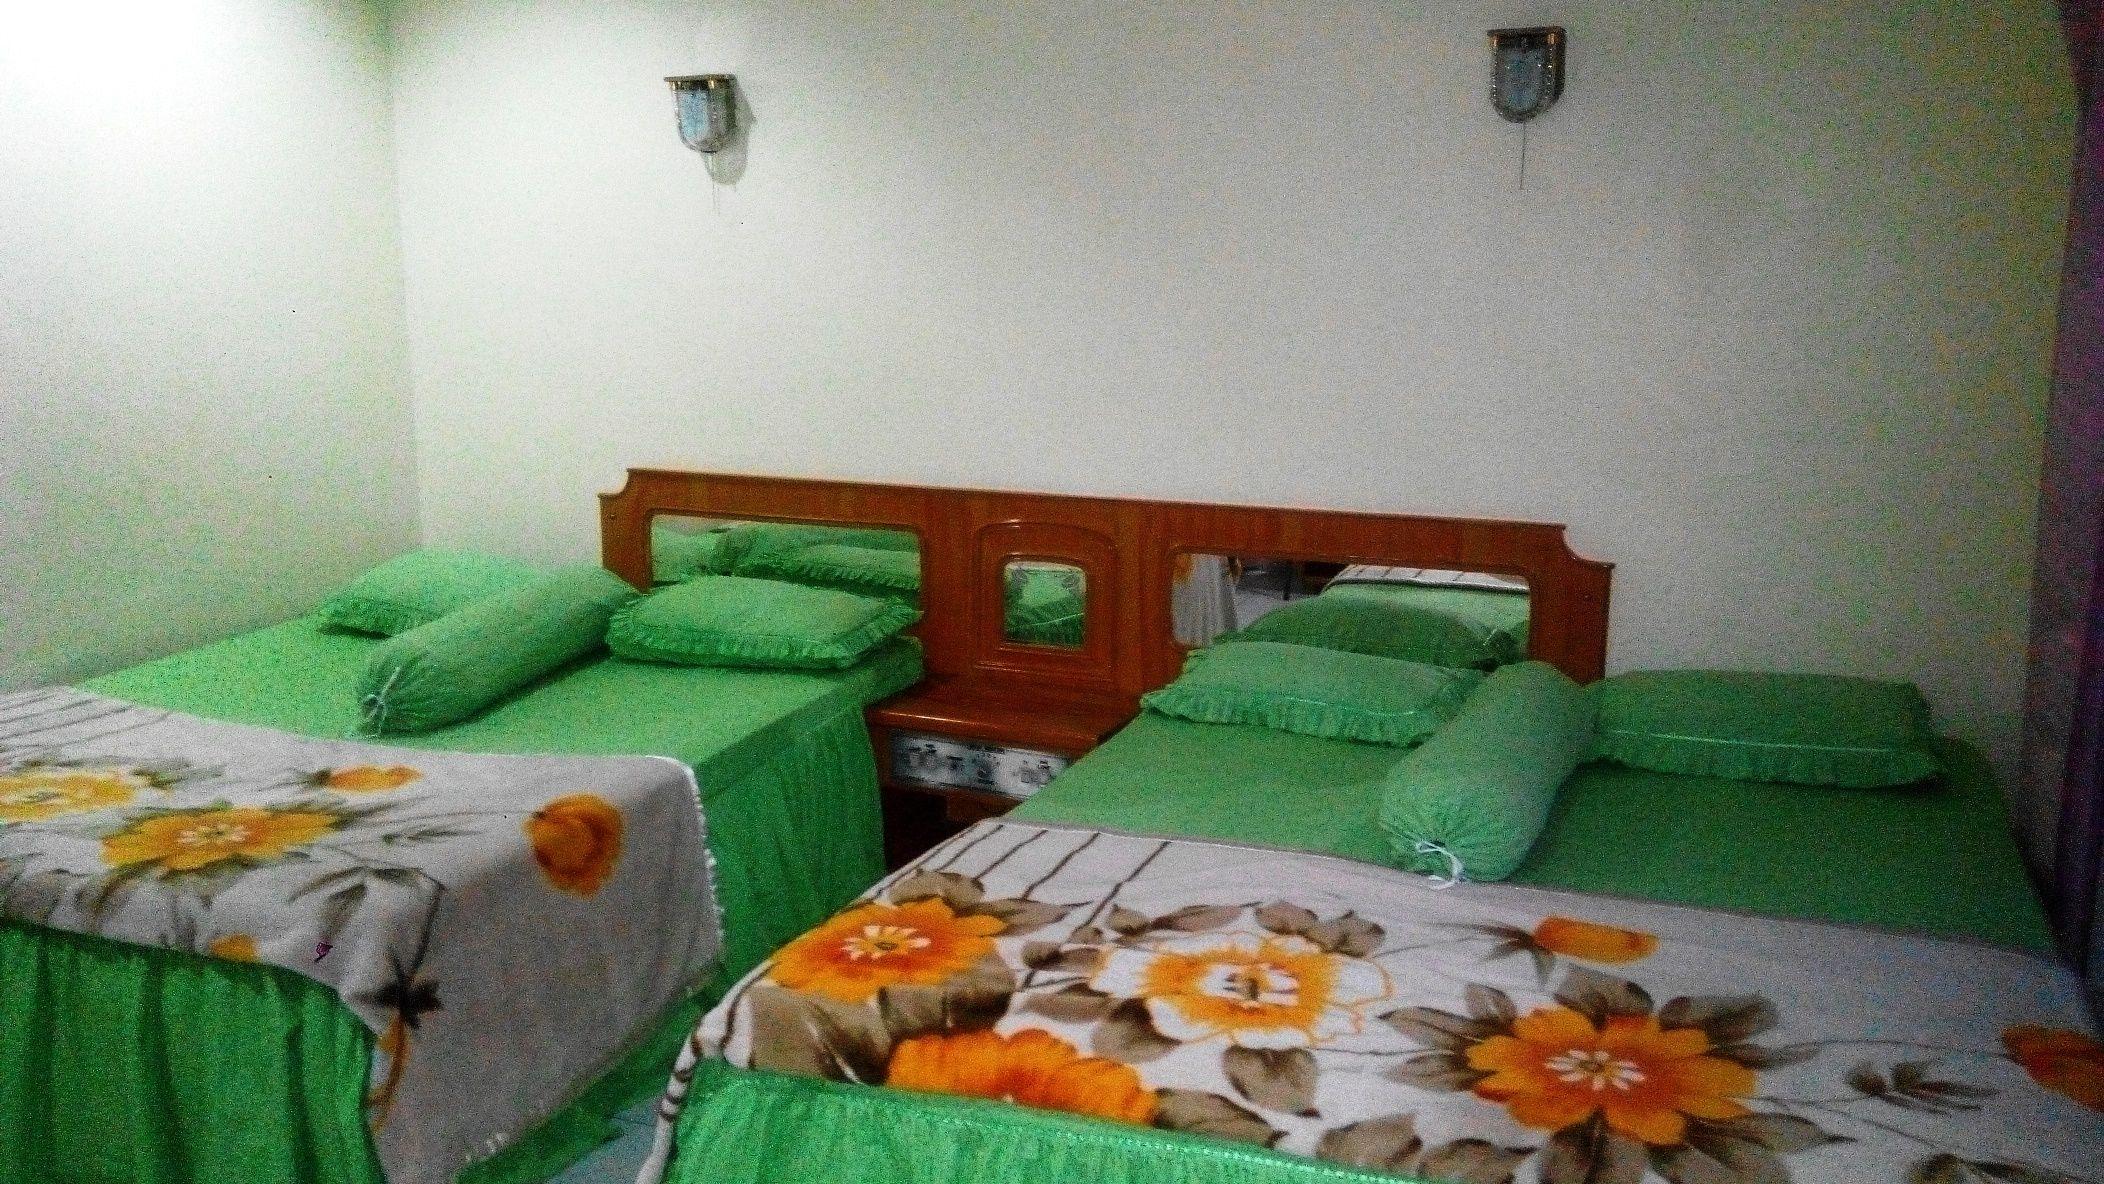 Melissa Palace Hotel & Karaoke, Simalungun